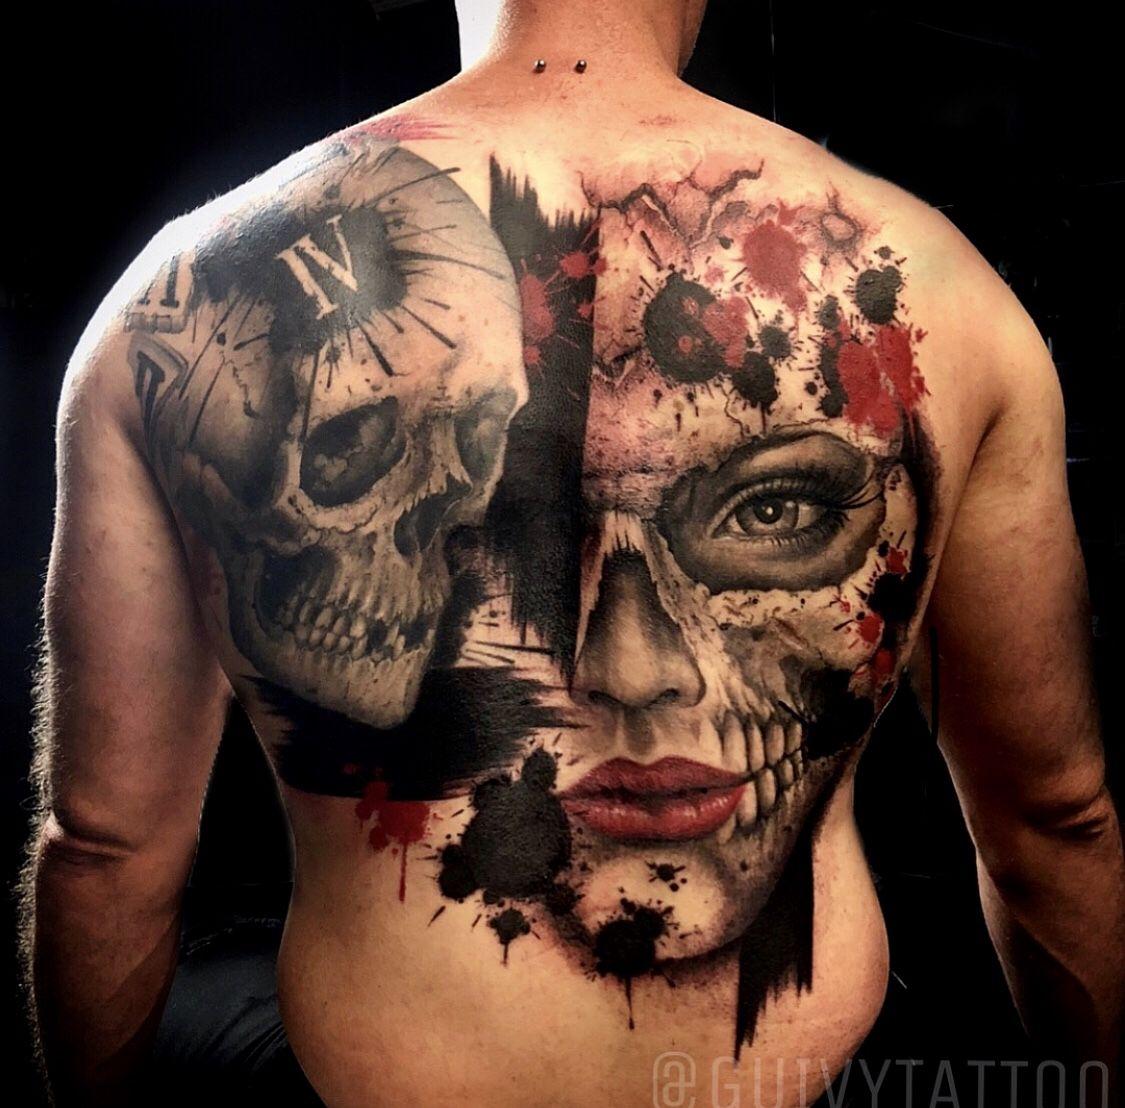 783e5a840b7f9 Guivy Tattoo - ART FOR SINNERS (Geneva - Geneve) #guivy #geneve #skull # tatouage #tattoos #trashpolka #skulls #blackwork #blackandred #woman  #portrait ...